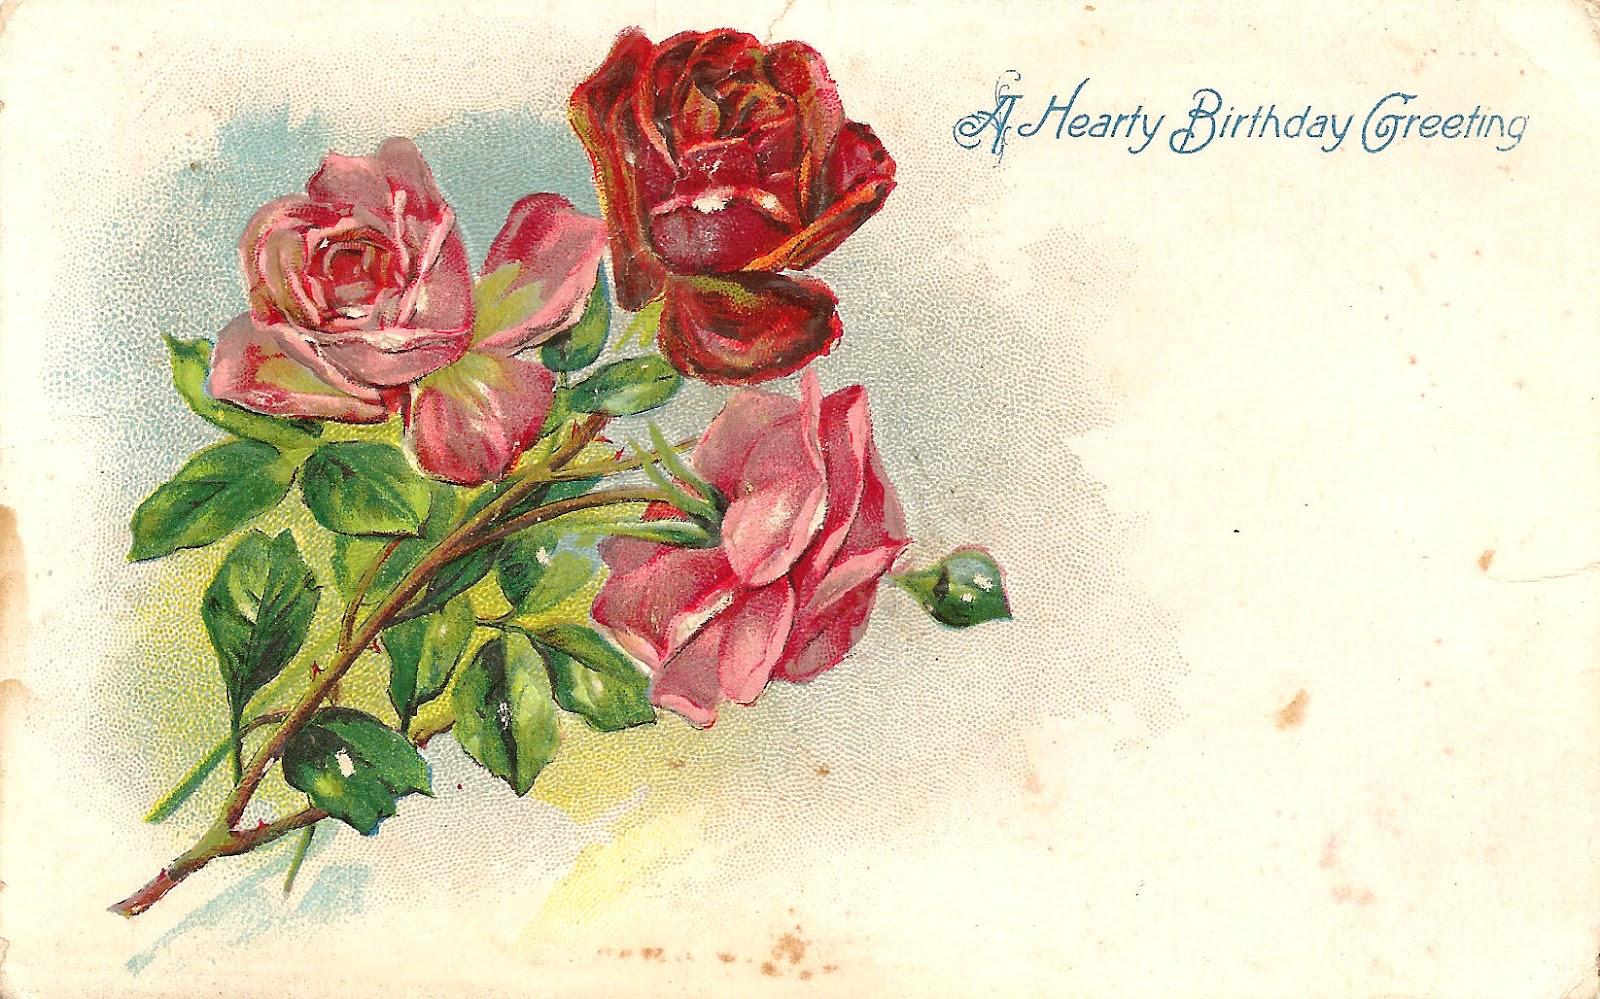 Vintage Flower clipart vintage birthday #7